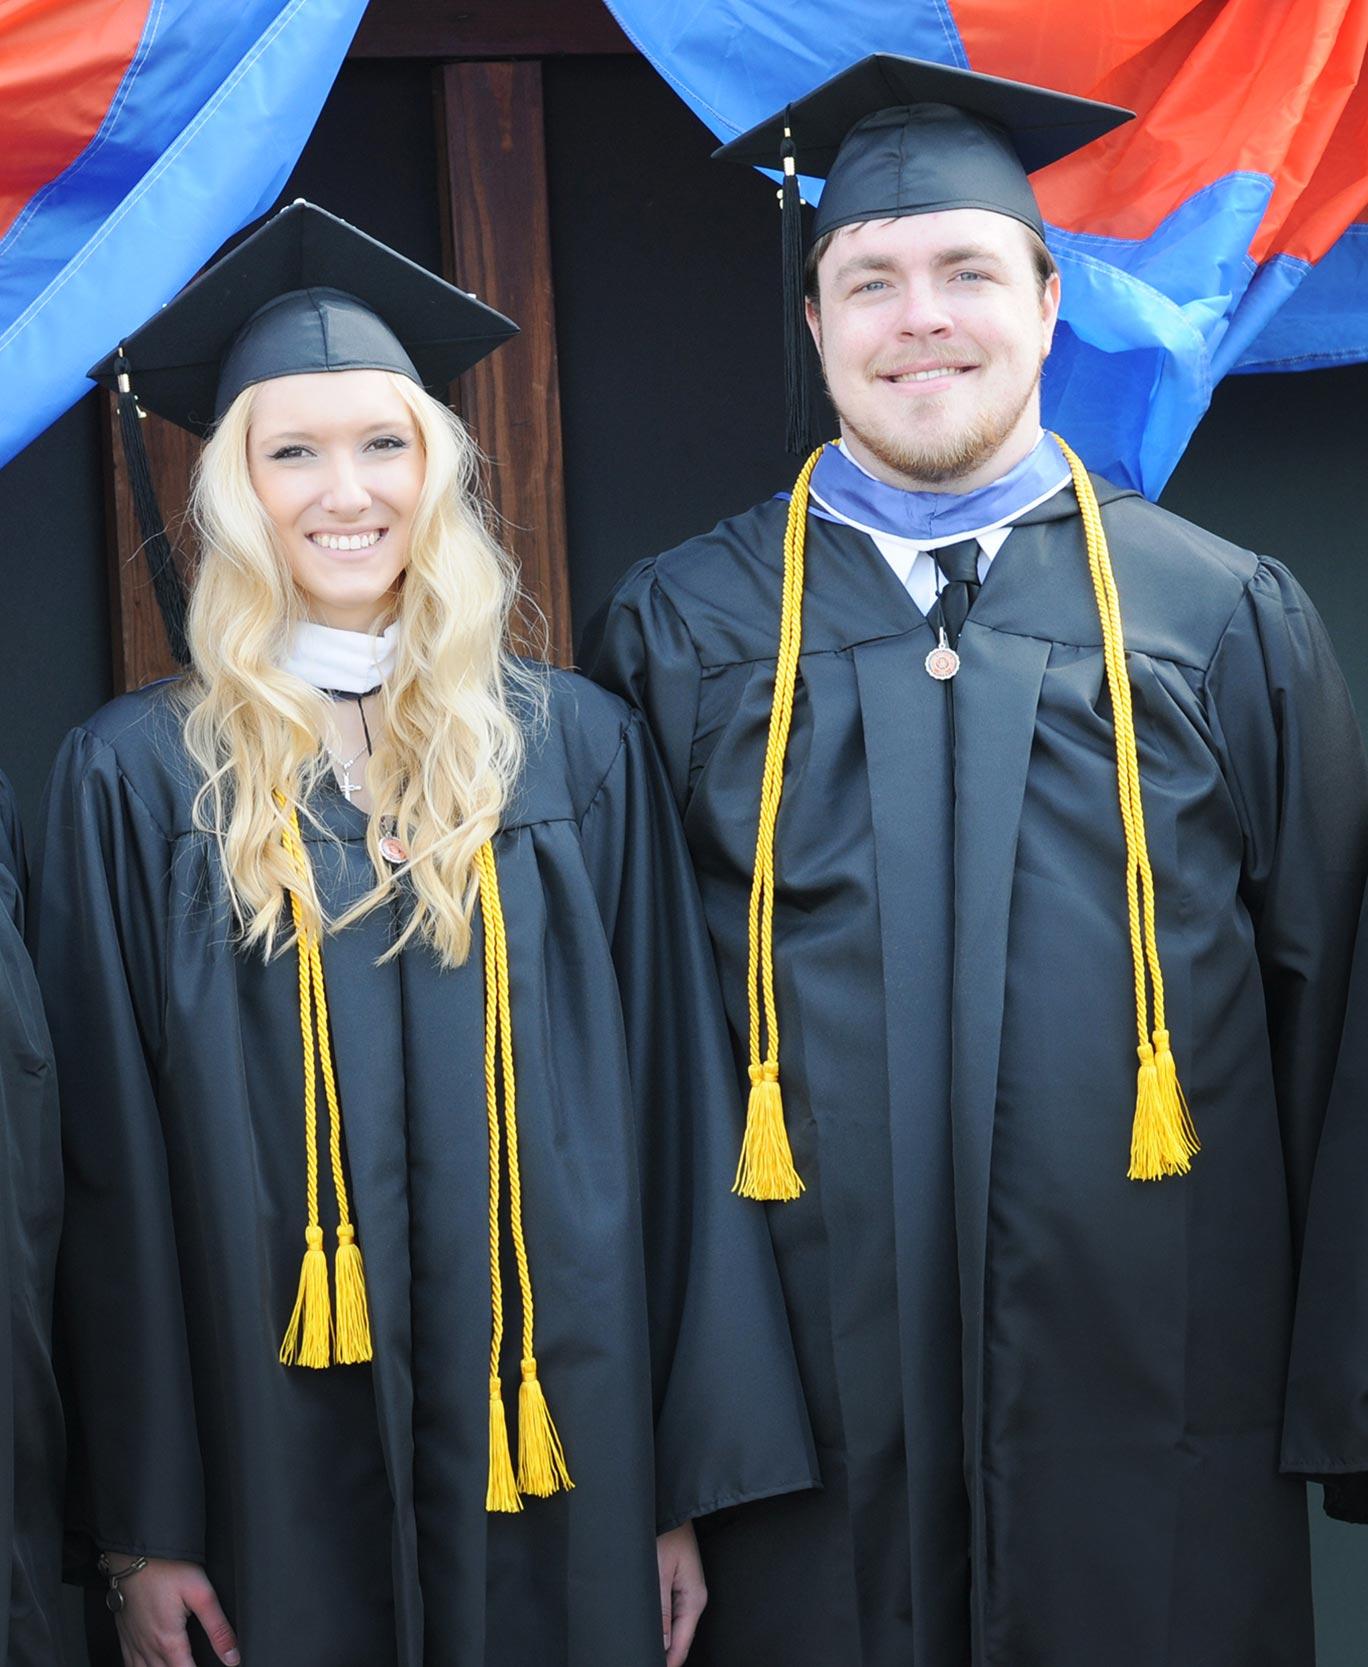 honors-at-graduation - Keystone College